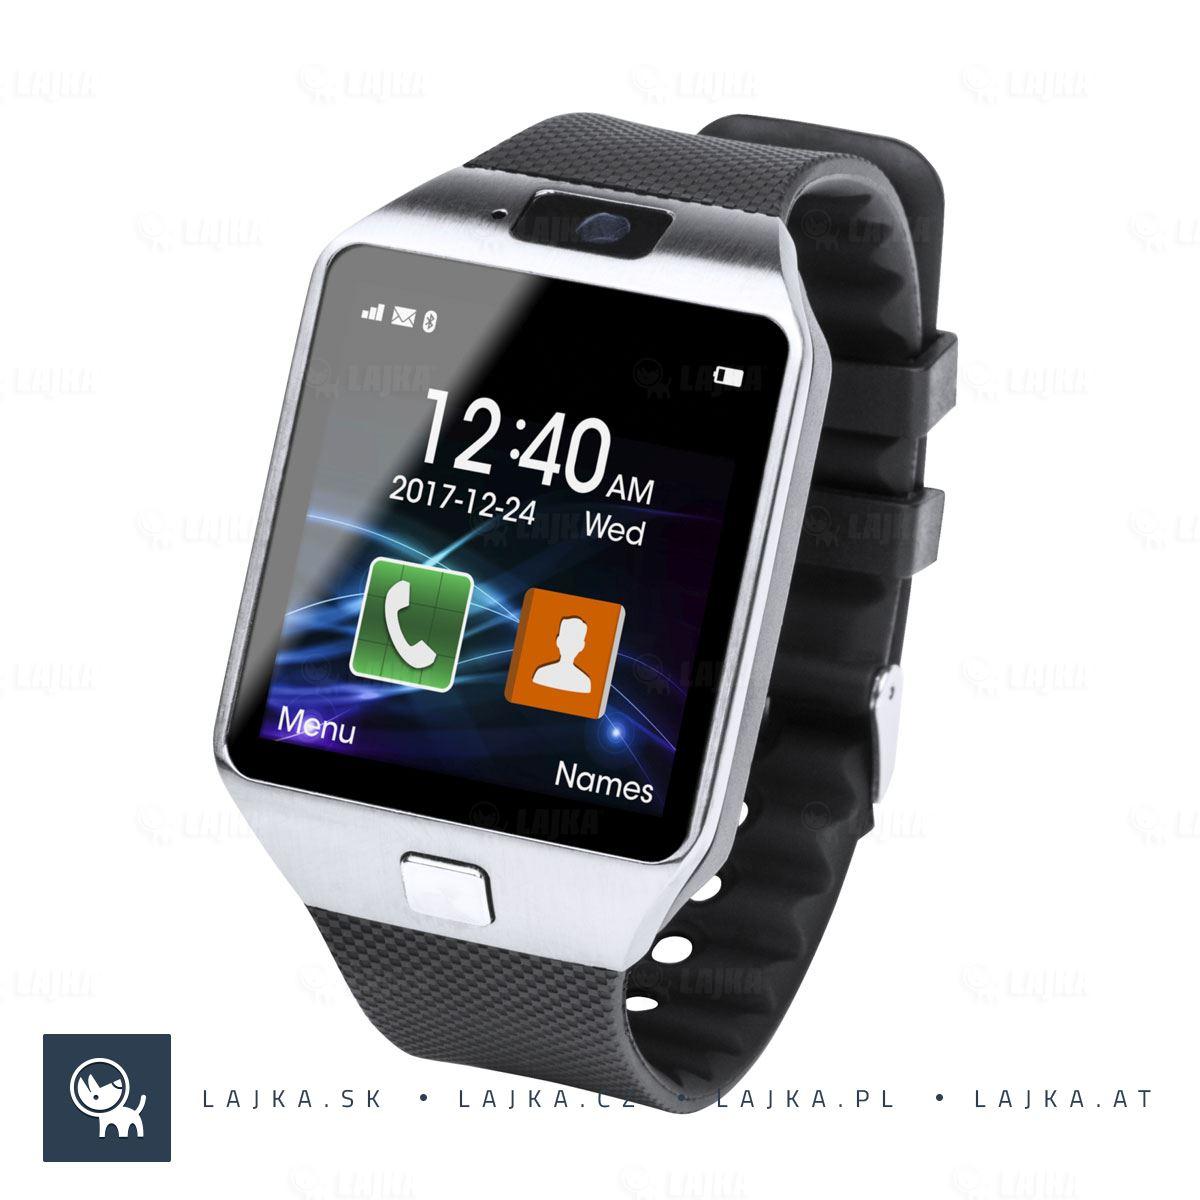 Smart hodinky Harling (1) 9344ce78a5d